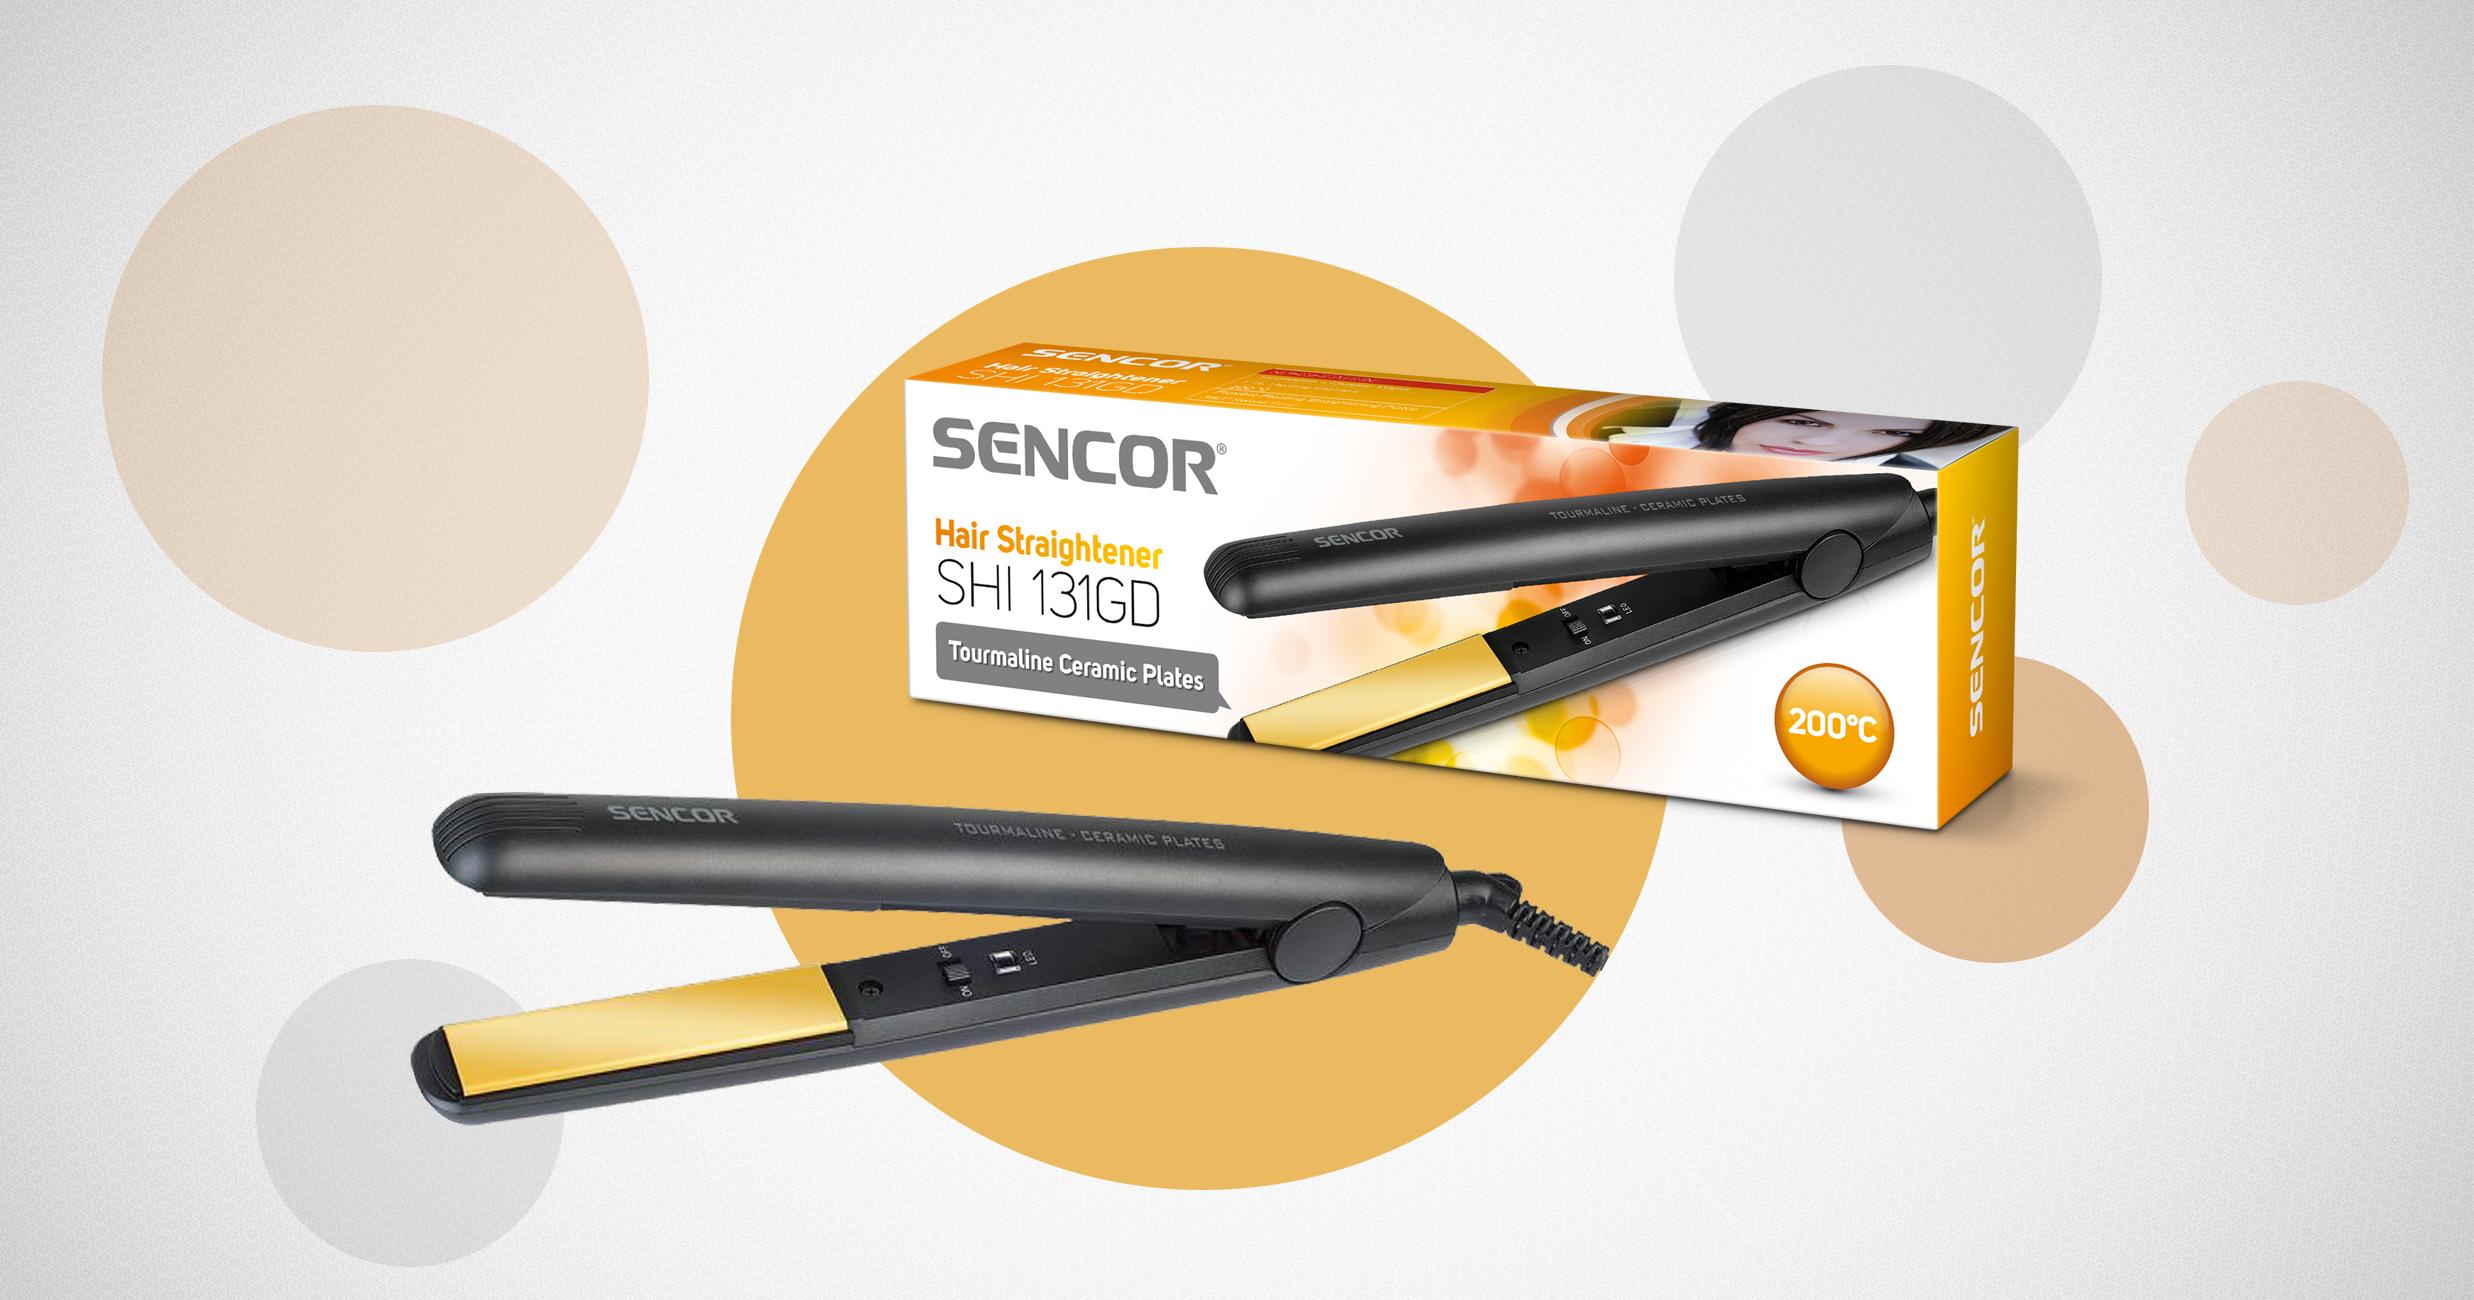 Sencor SHI 131GD